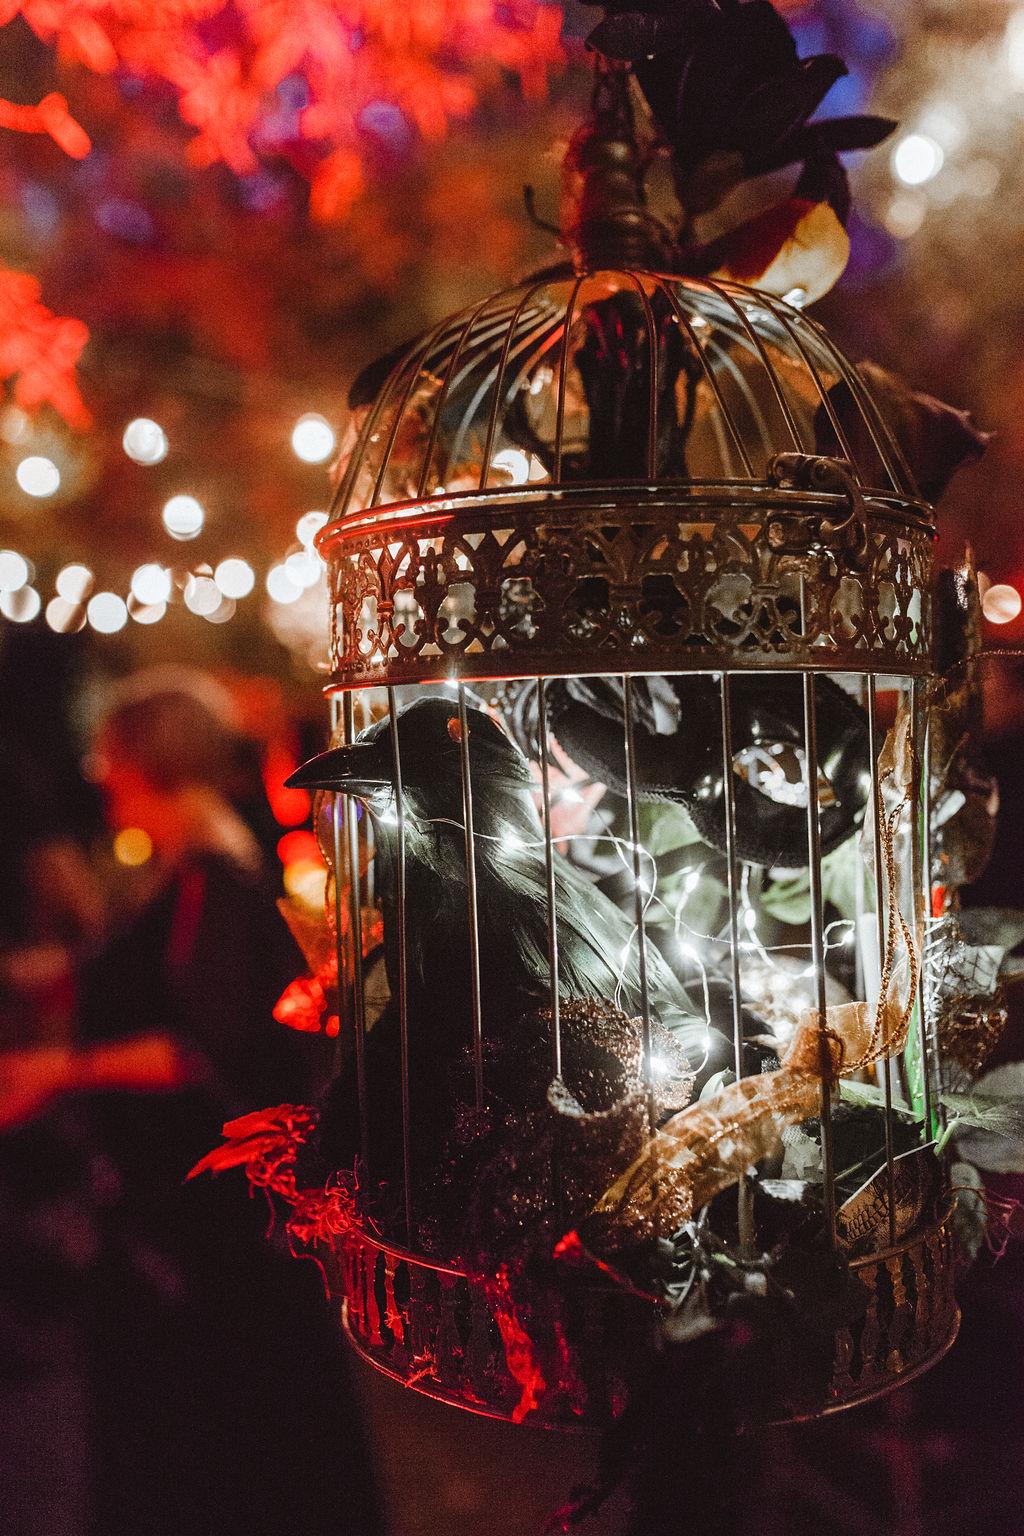 October-Details-Wedding-Pasadena-California-Halloween-Tim-Burton-Alice-Wonderland-Whimsical-Hieusz-Photography-85.jpg